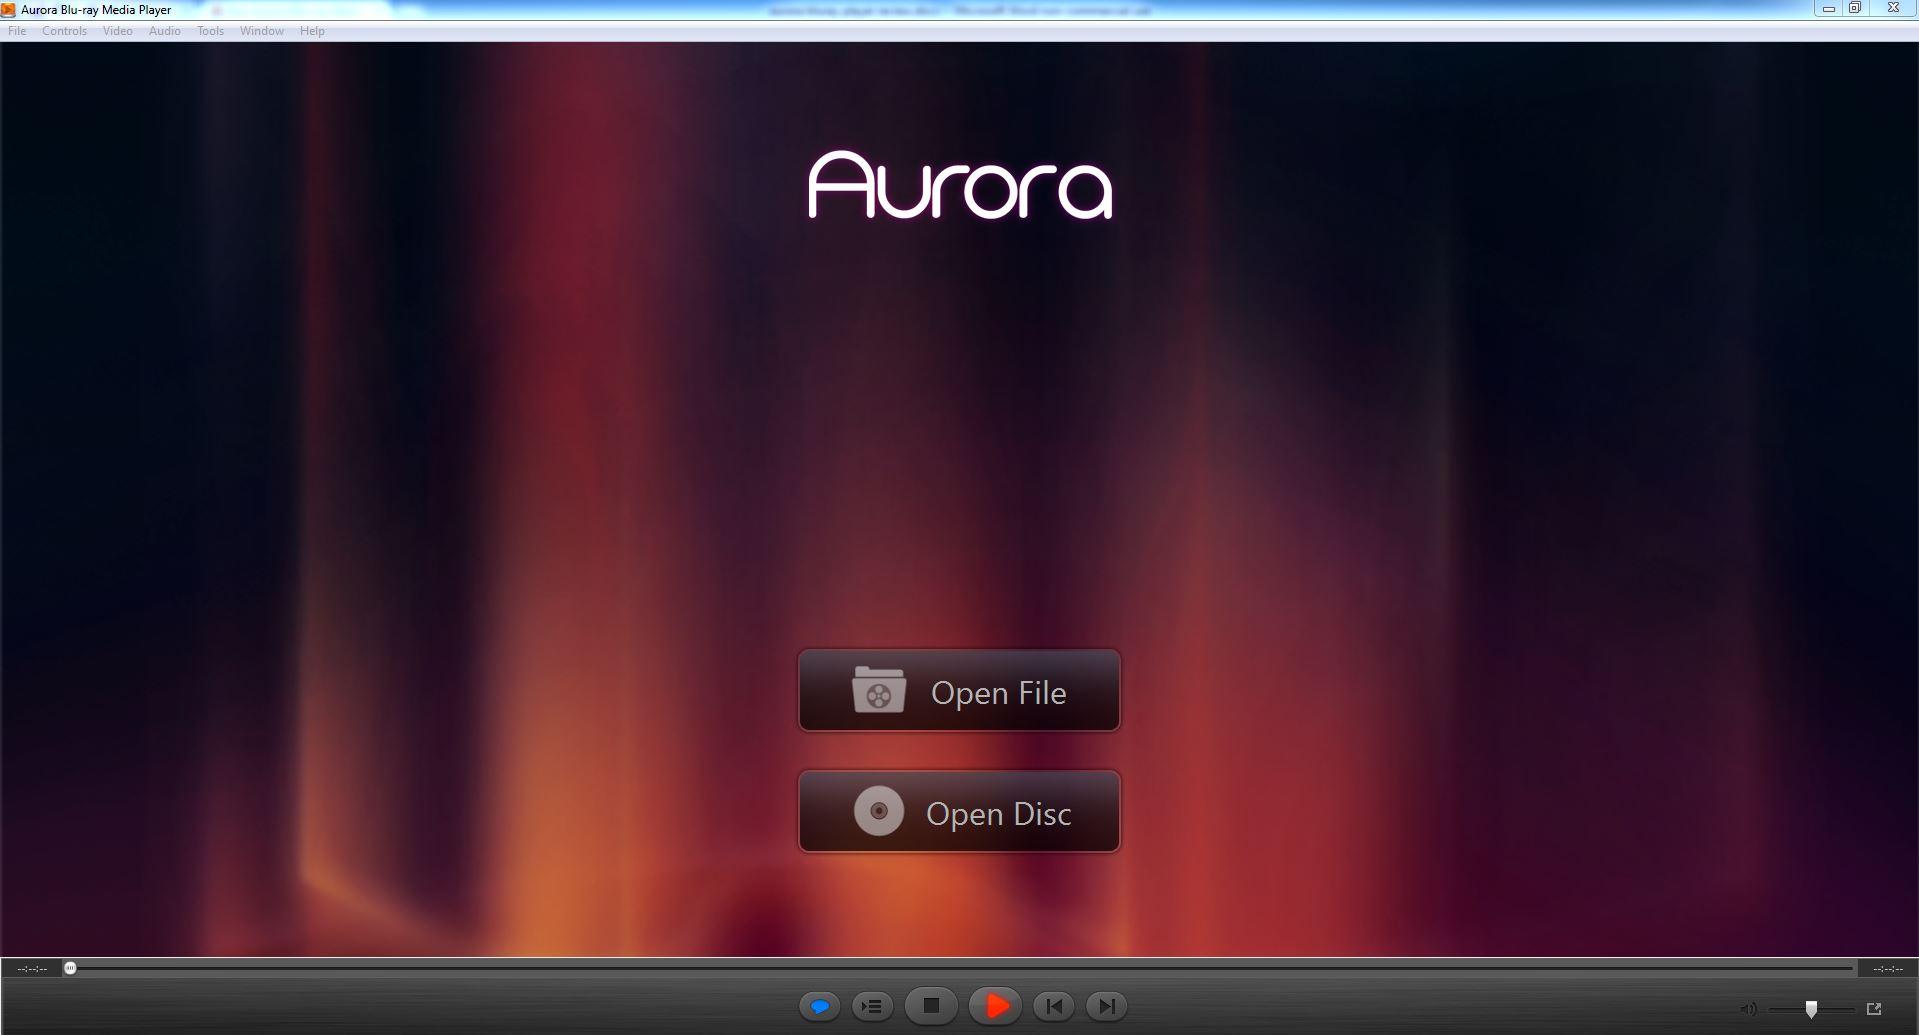 Amazon. Com: aurora blu-ray player for mac [download]: software.